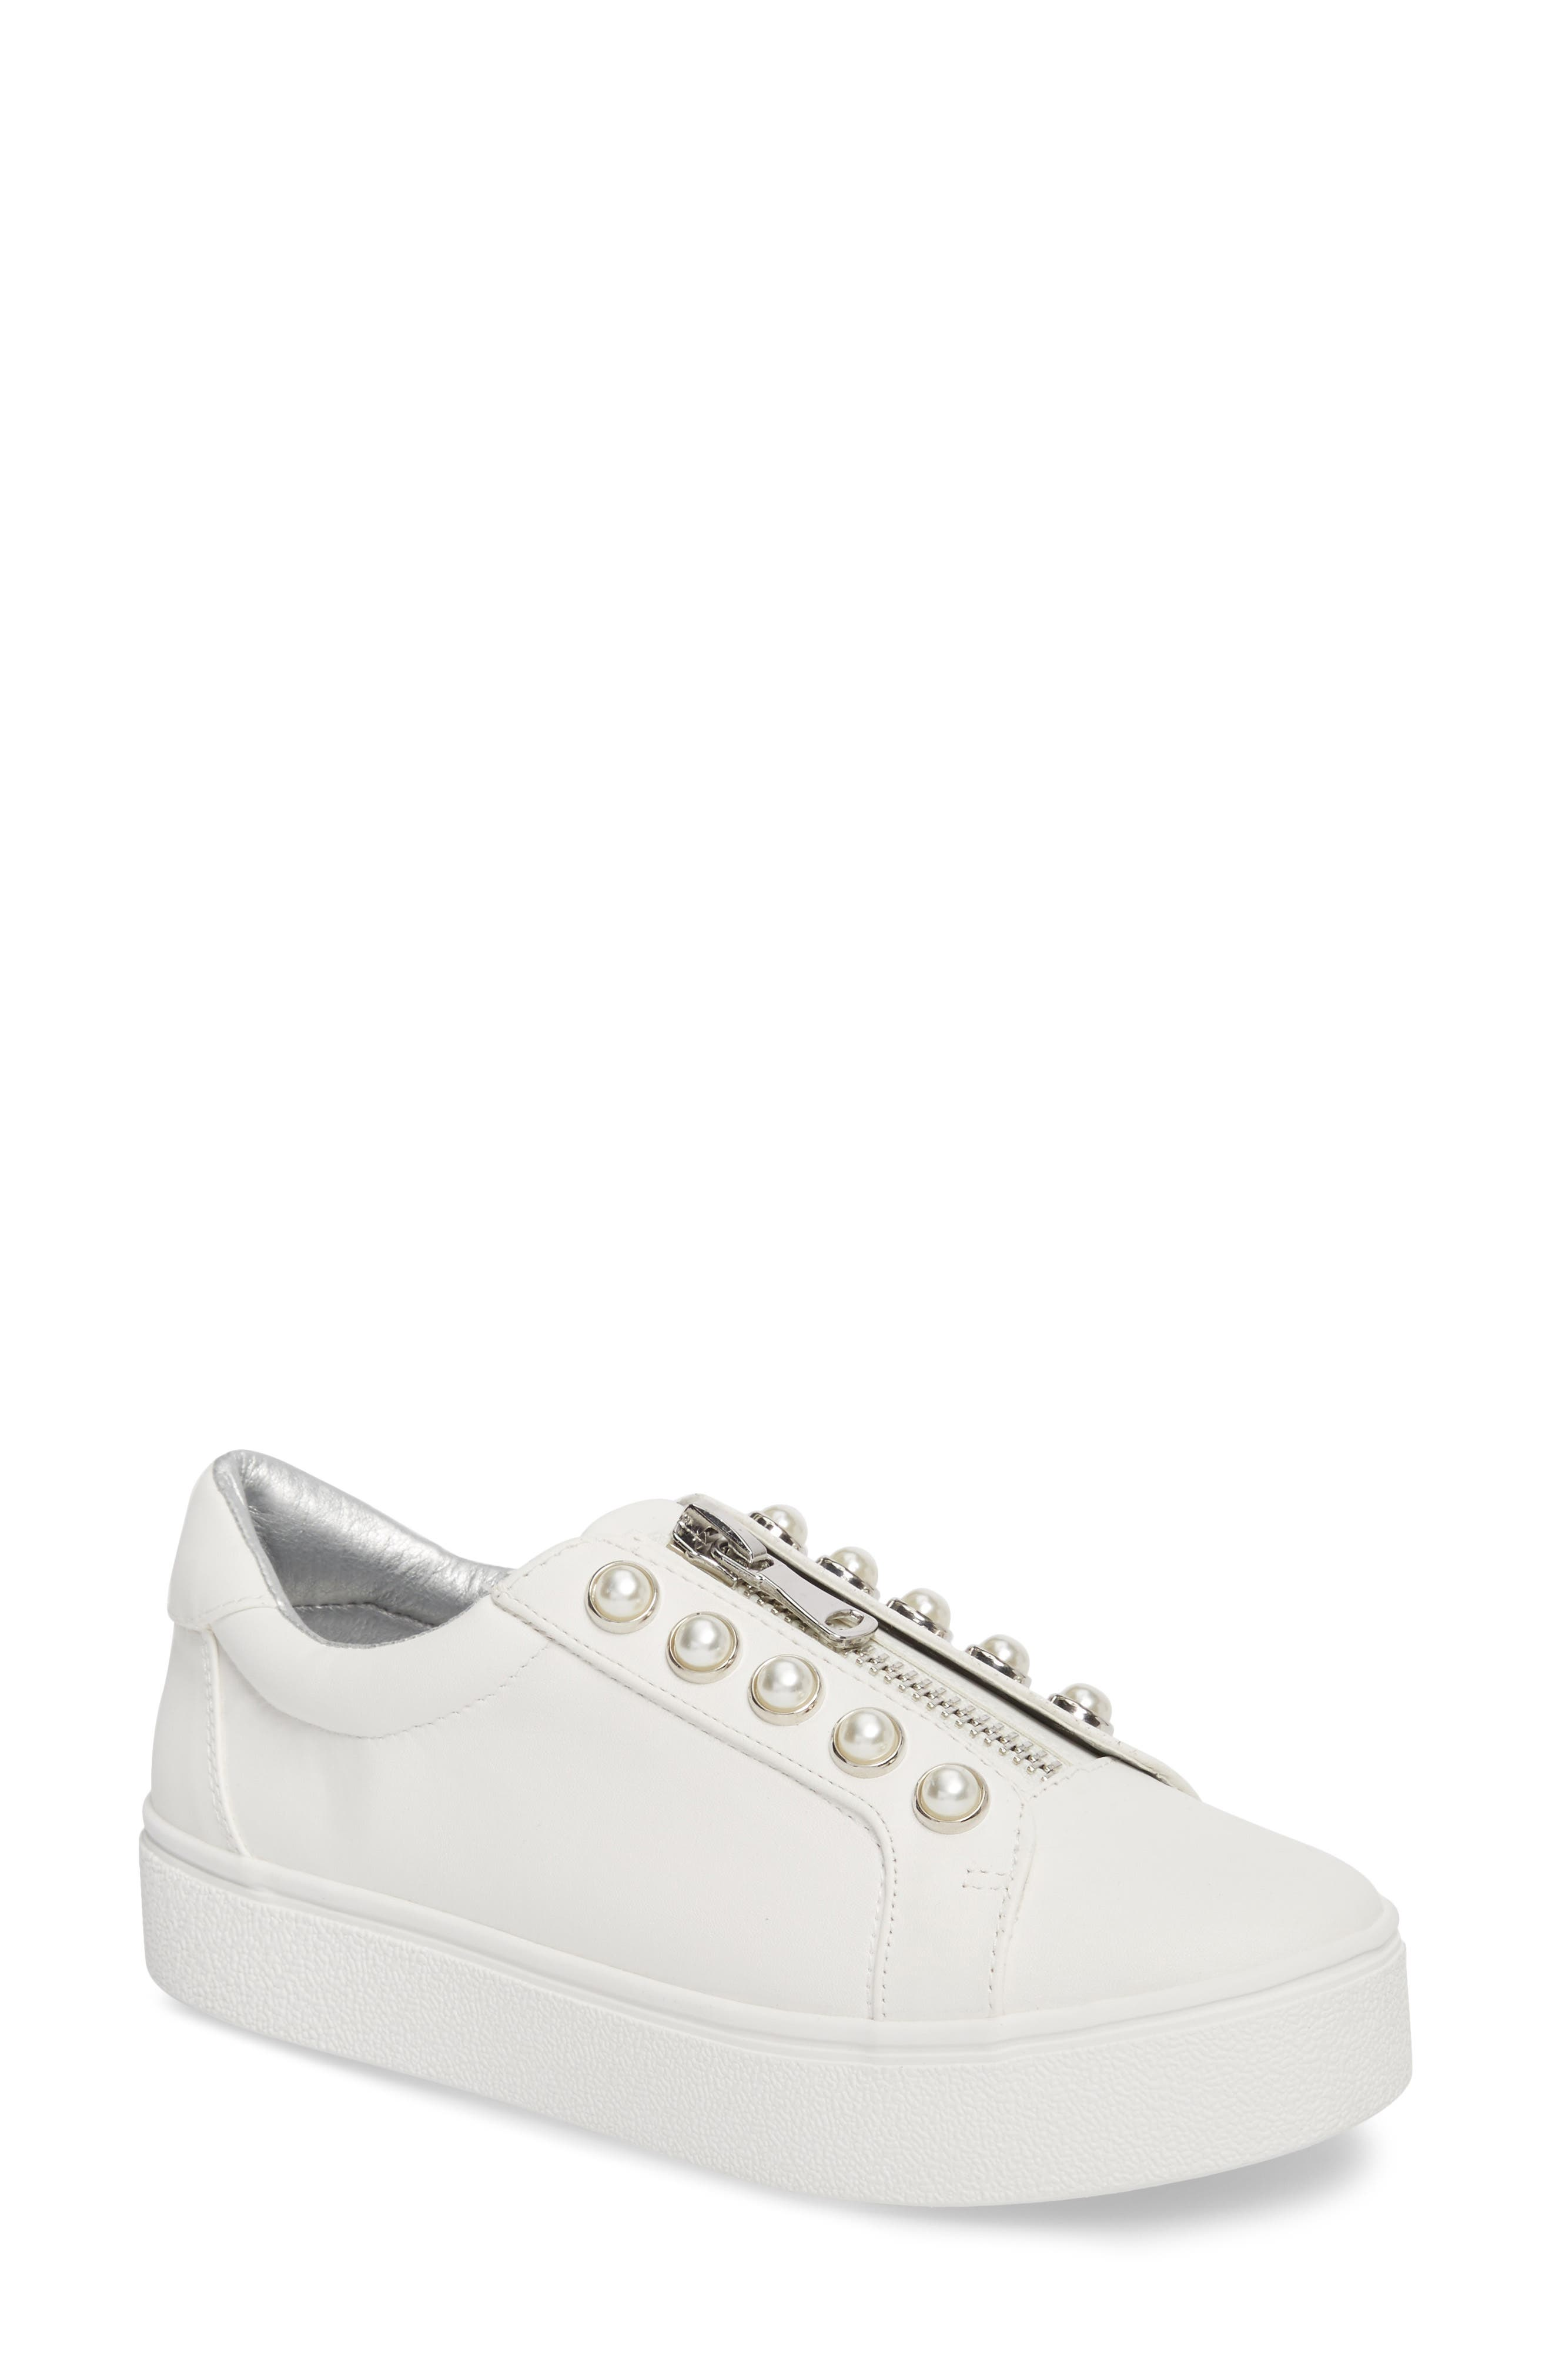 Lynn Embellished Platform Sneaker,                         Main,                         color, White Faux Leather